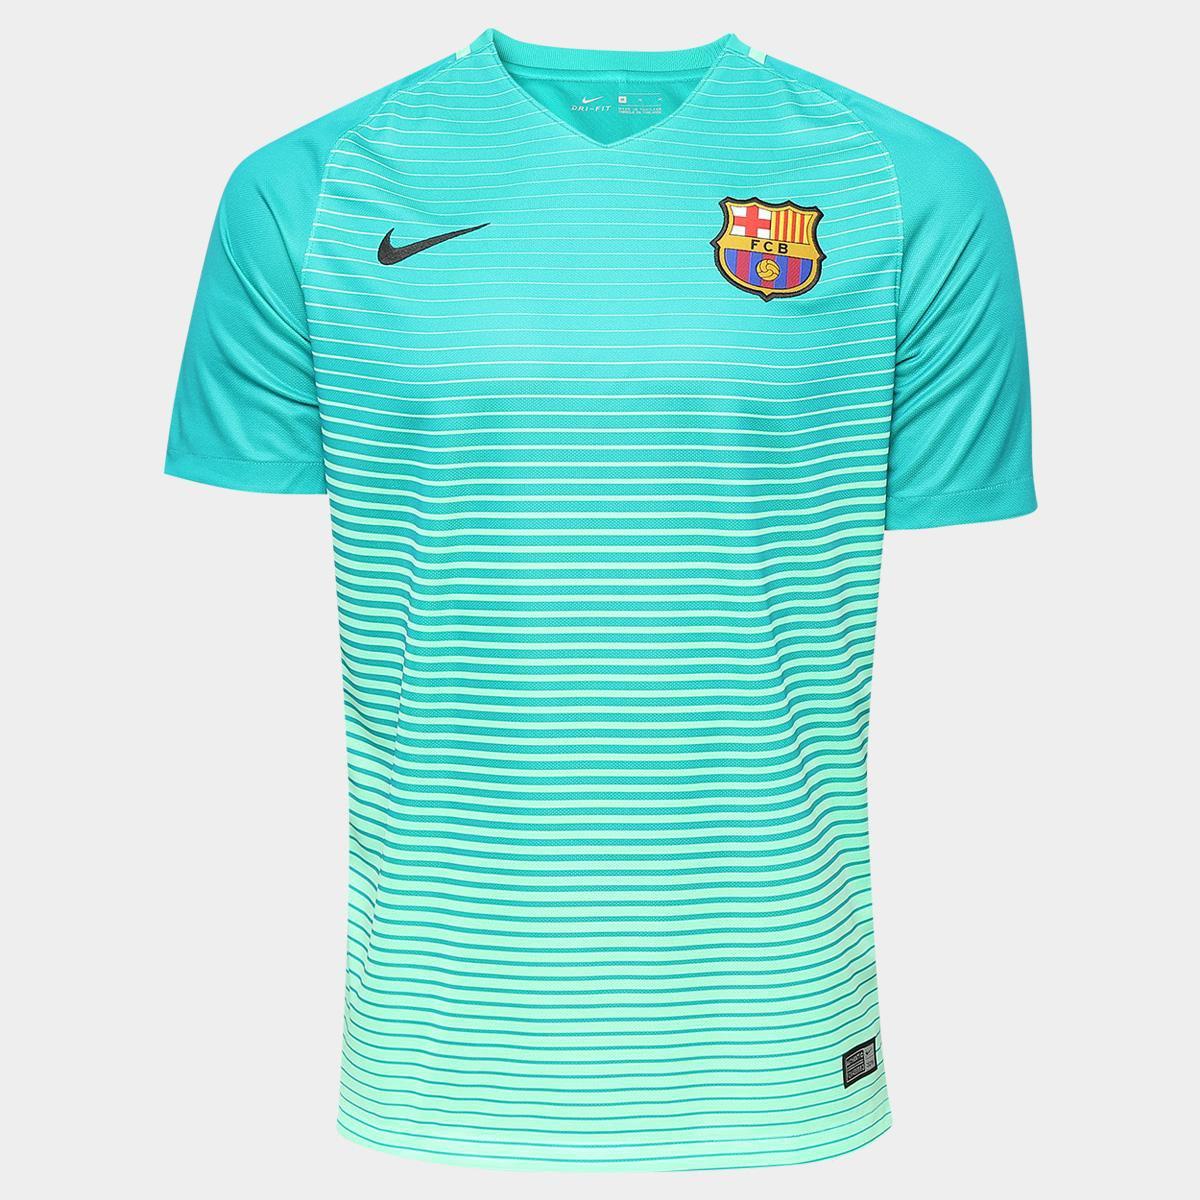 7dda27e89918d Camisa Barcelona Third 16 17 s nº Torcedor Nike Masculina - Compre Agora